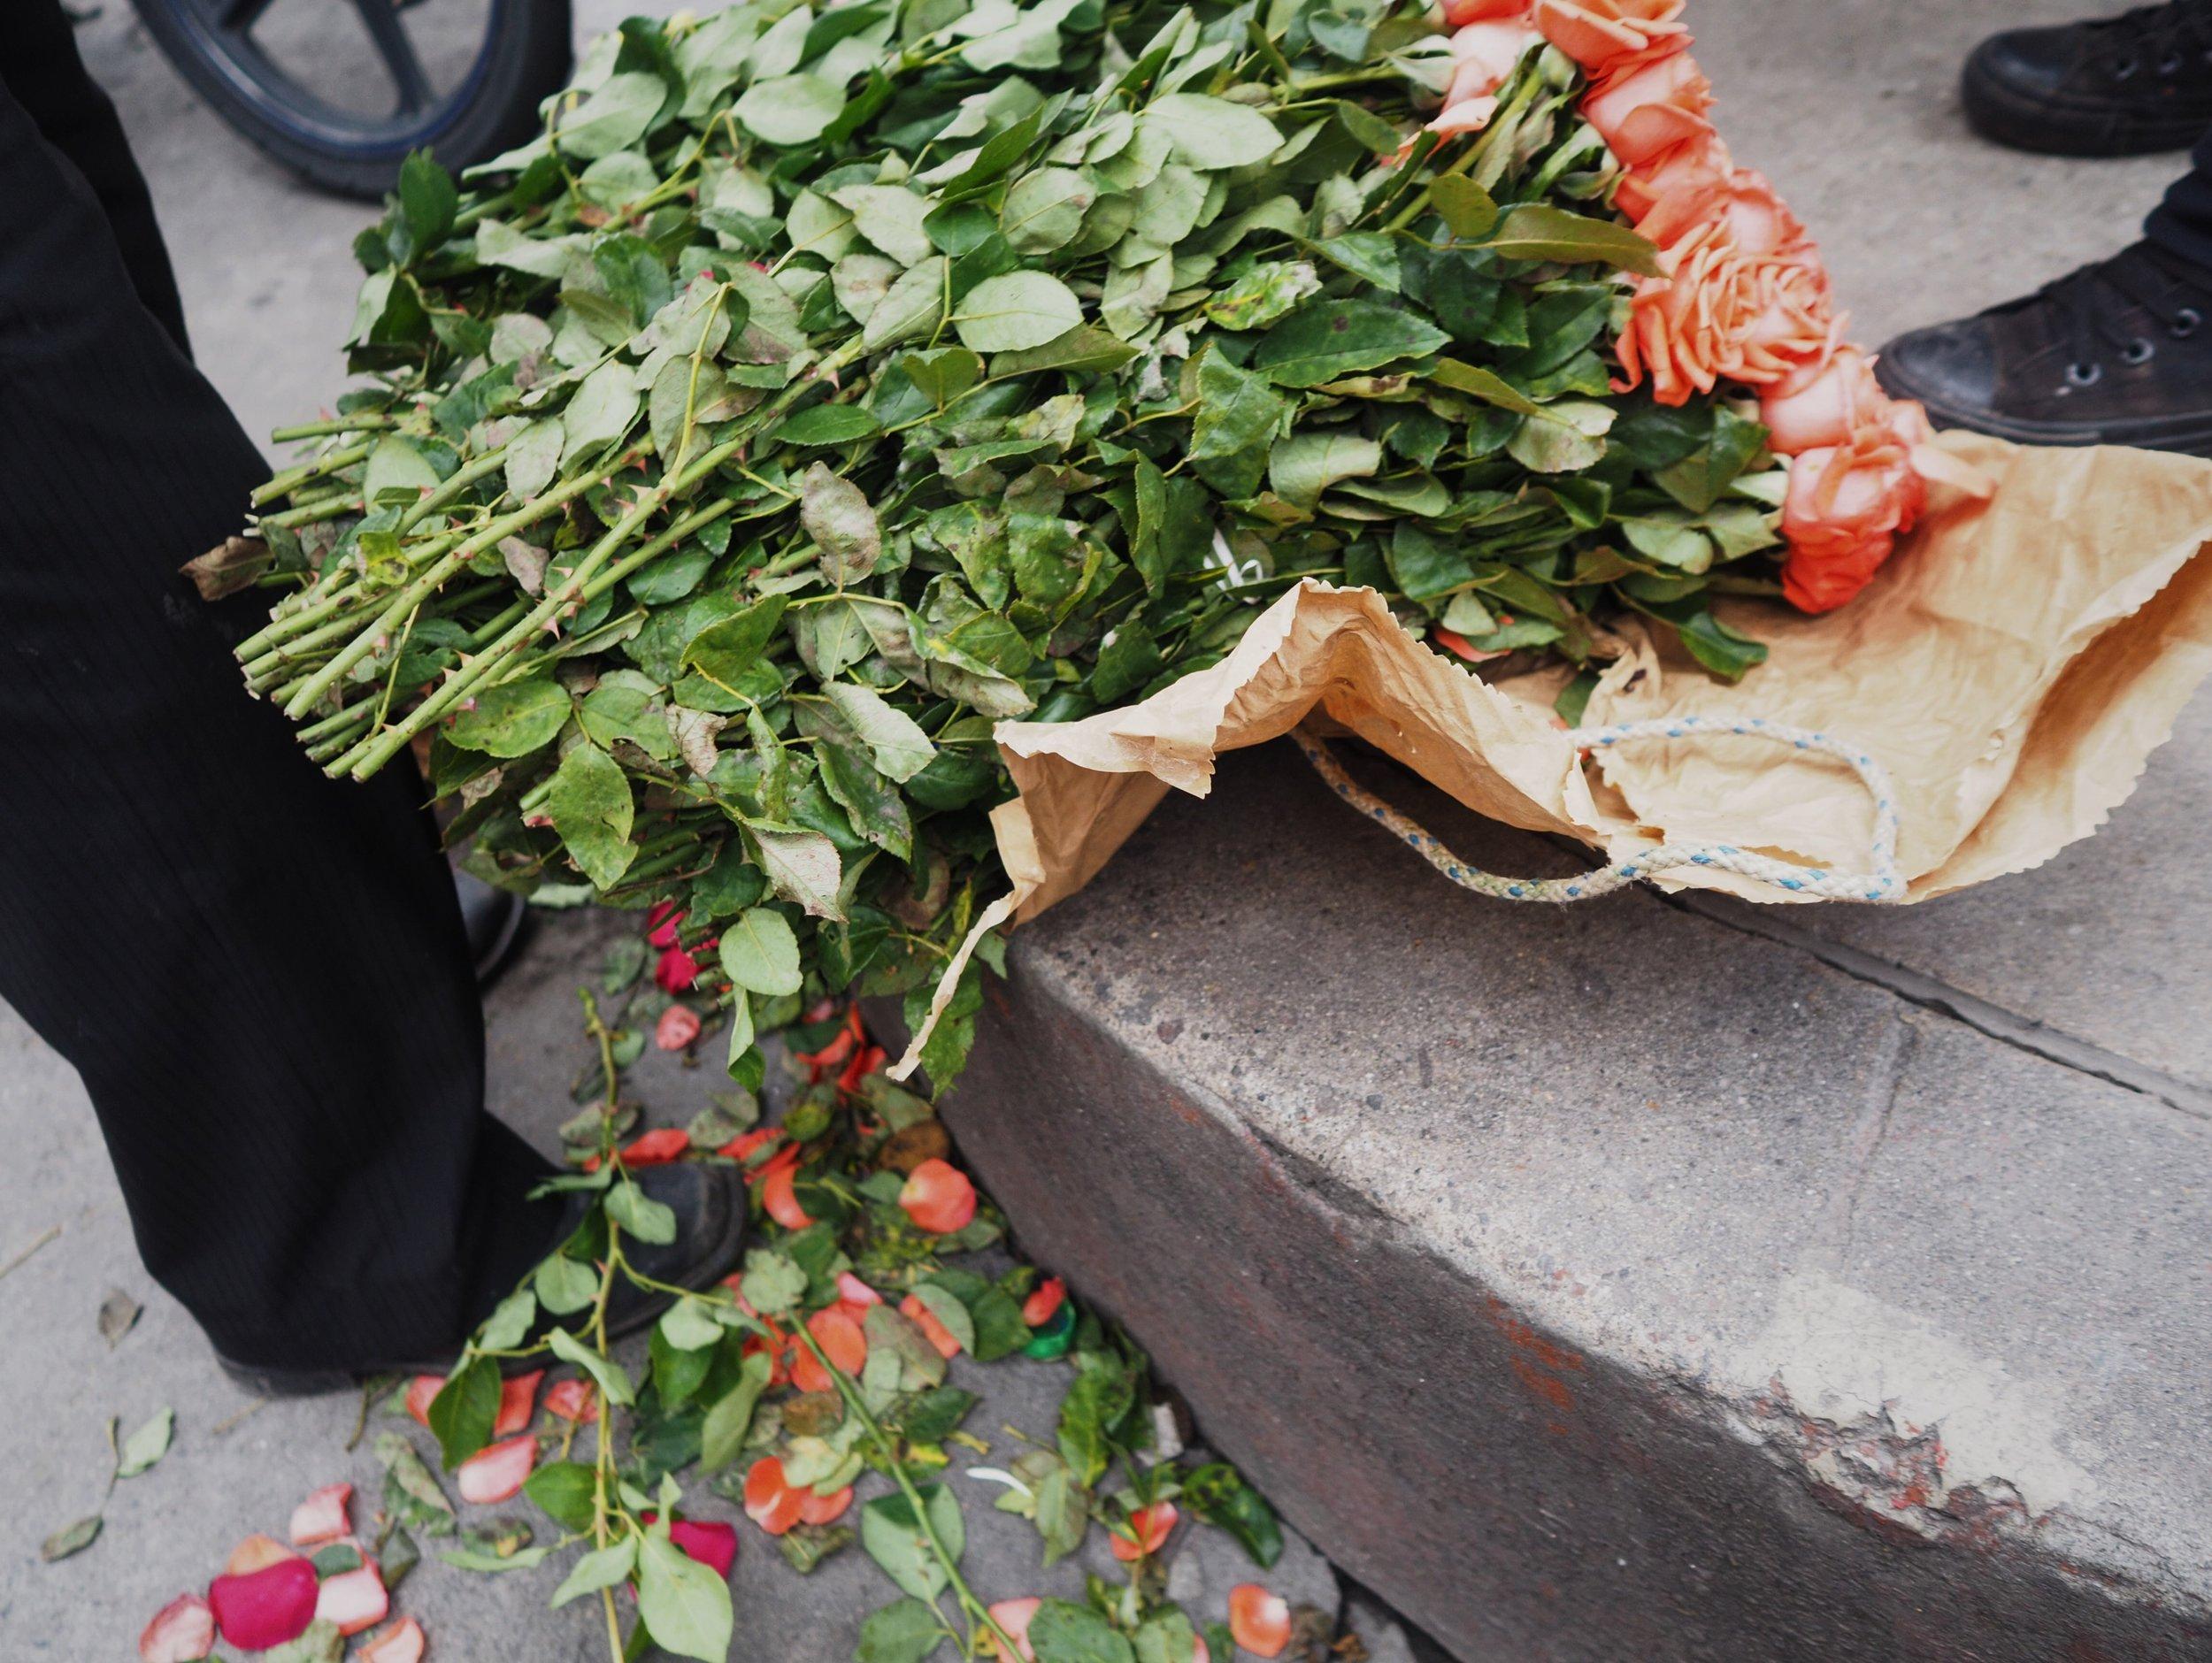 Flower vendor, Xela